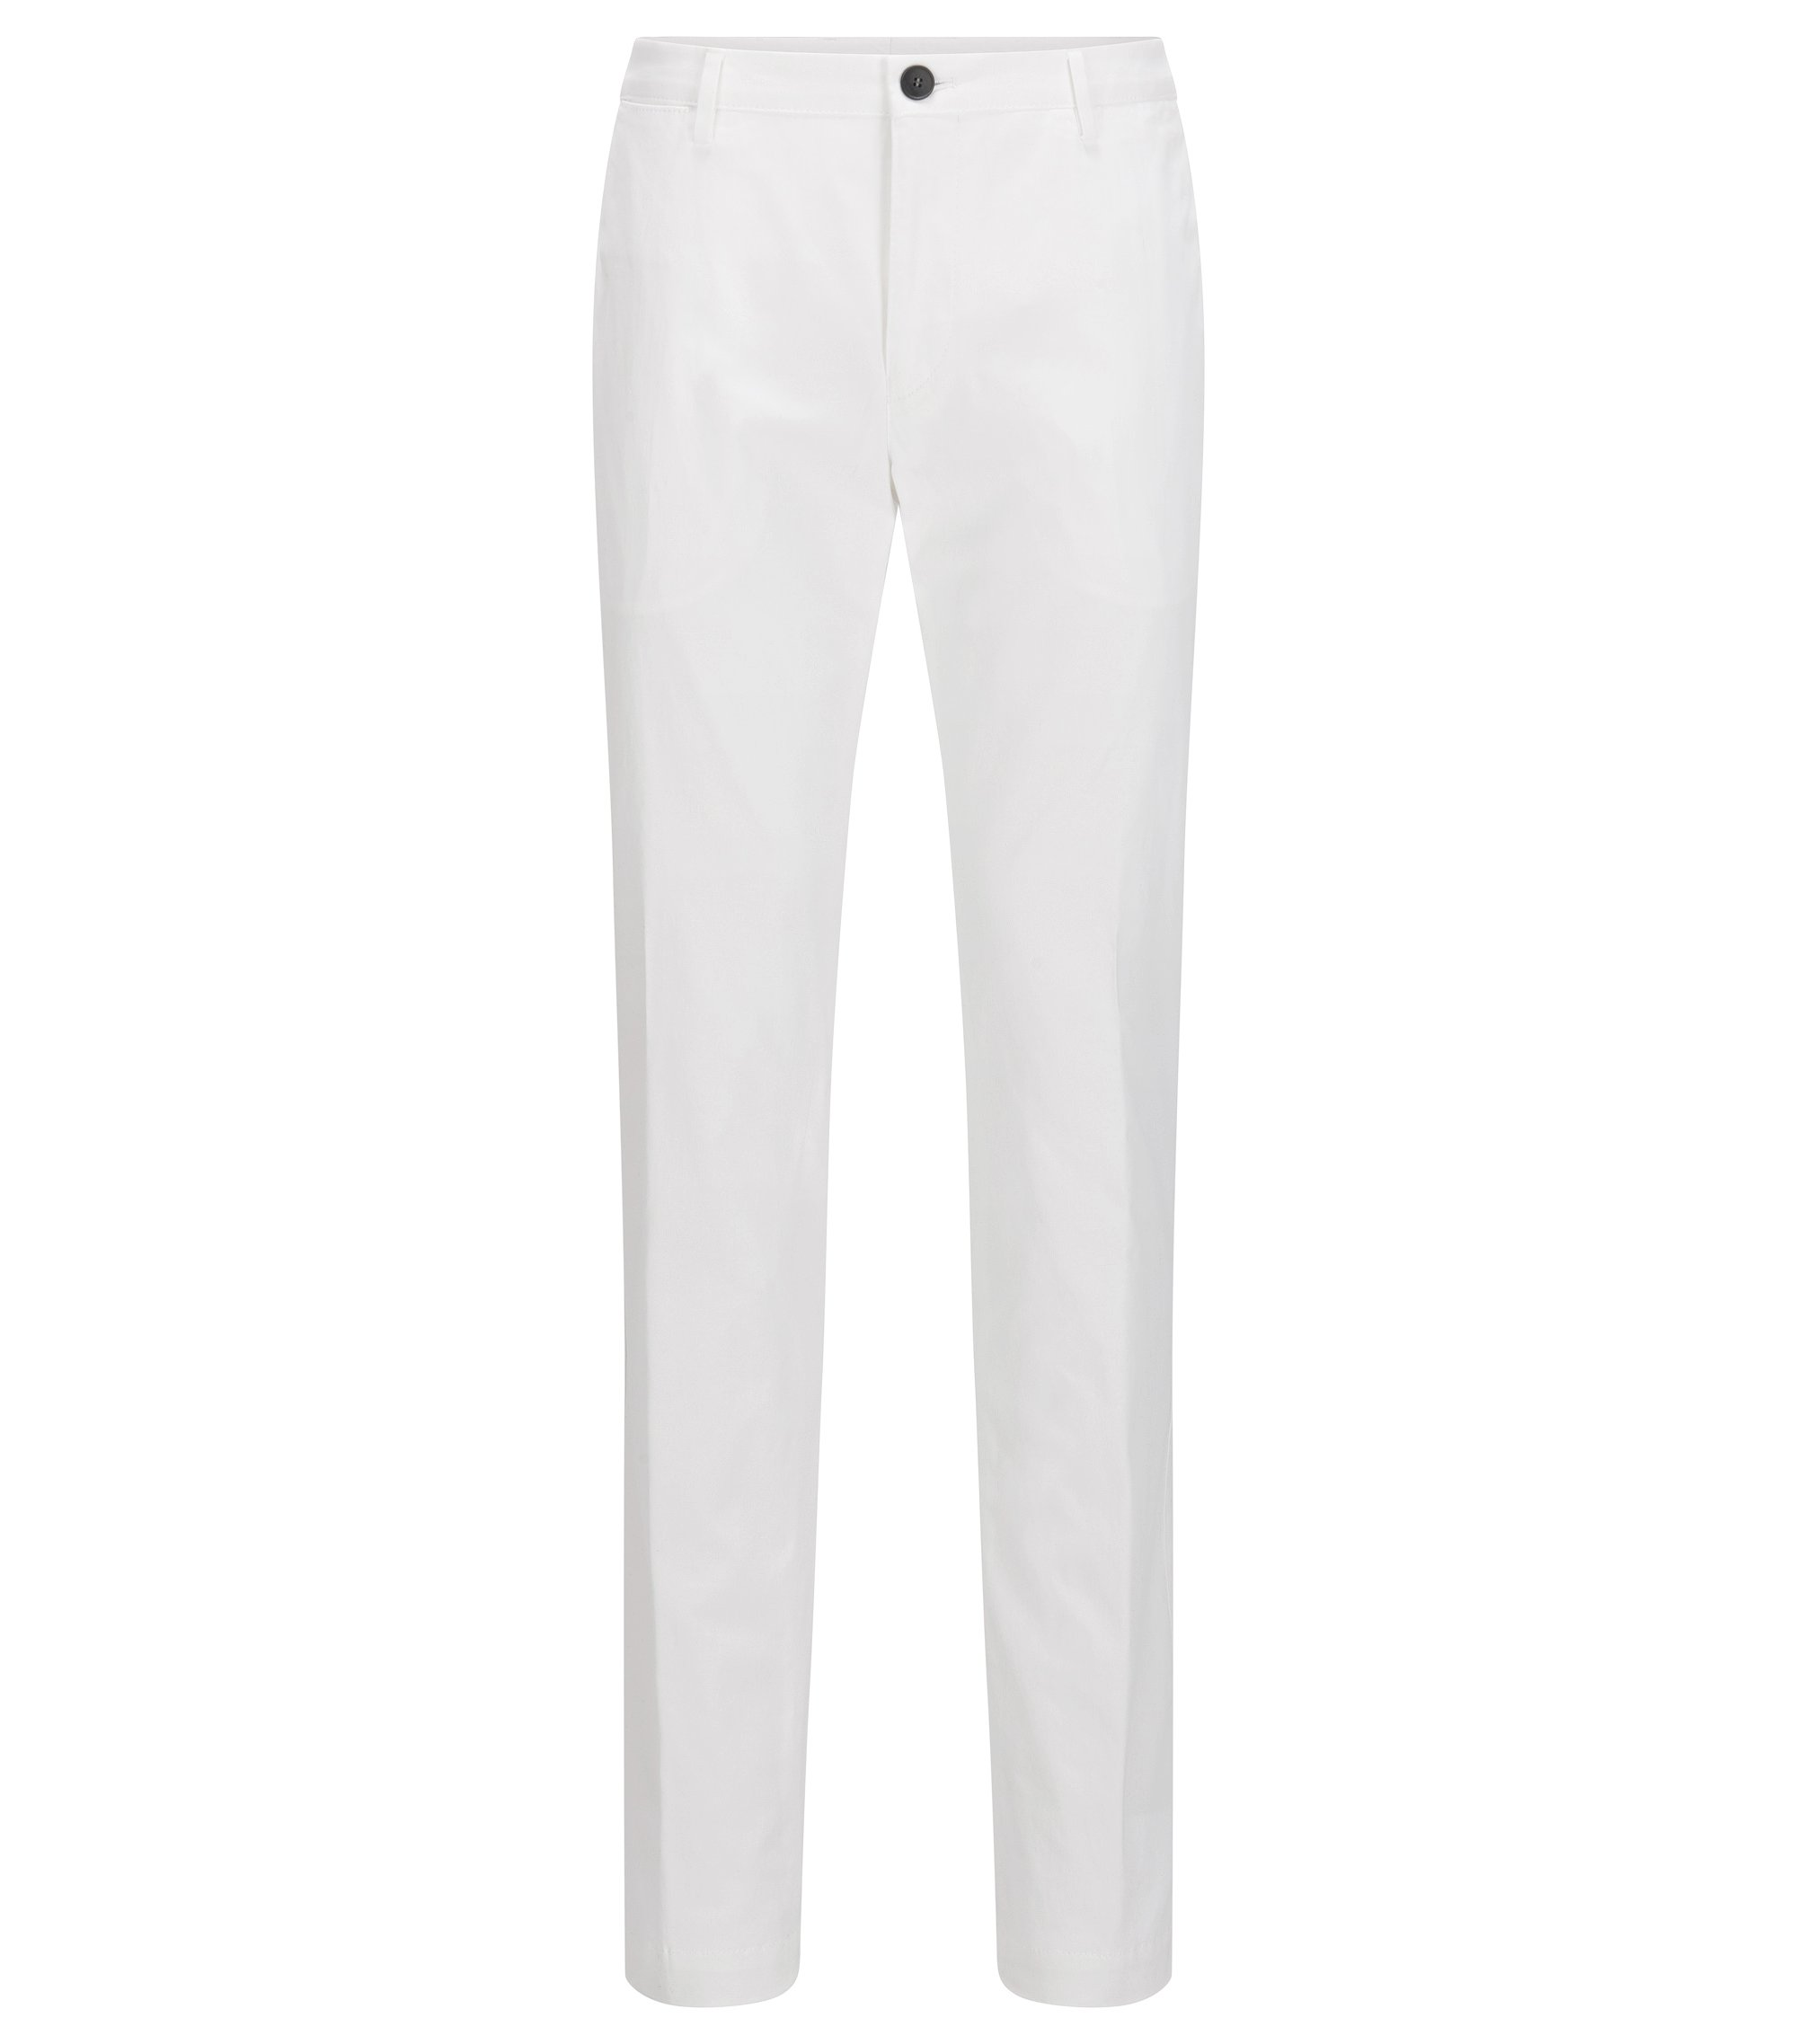 Chino Slim Fit en coton stretch délavé, Blanc